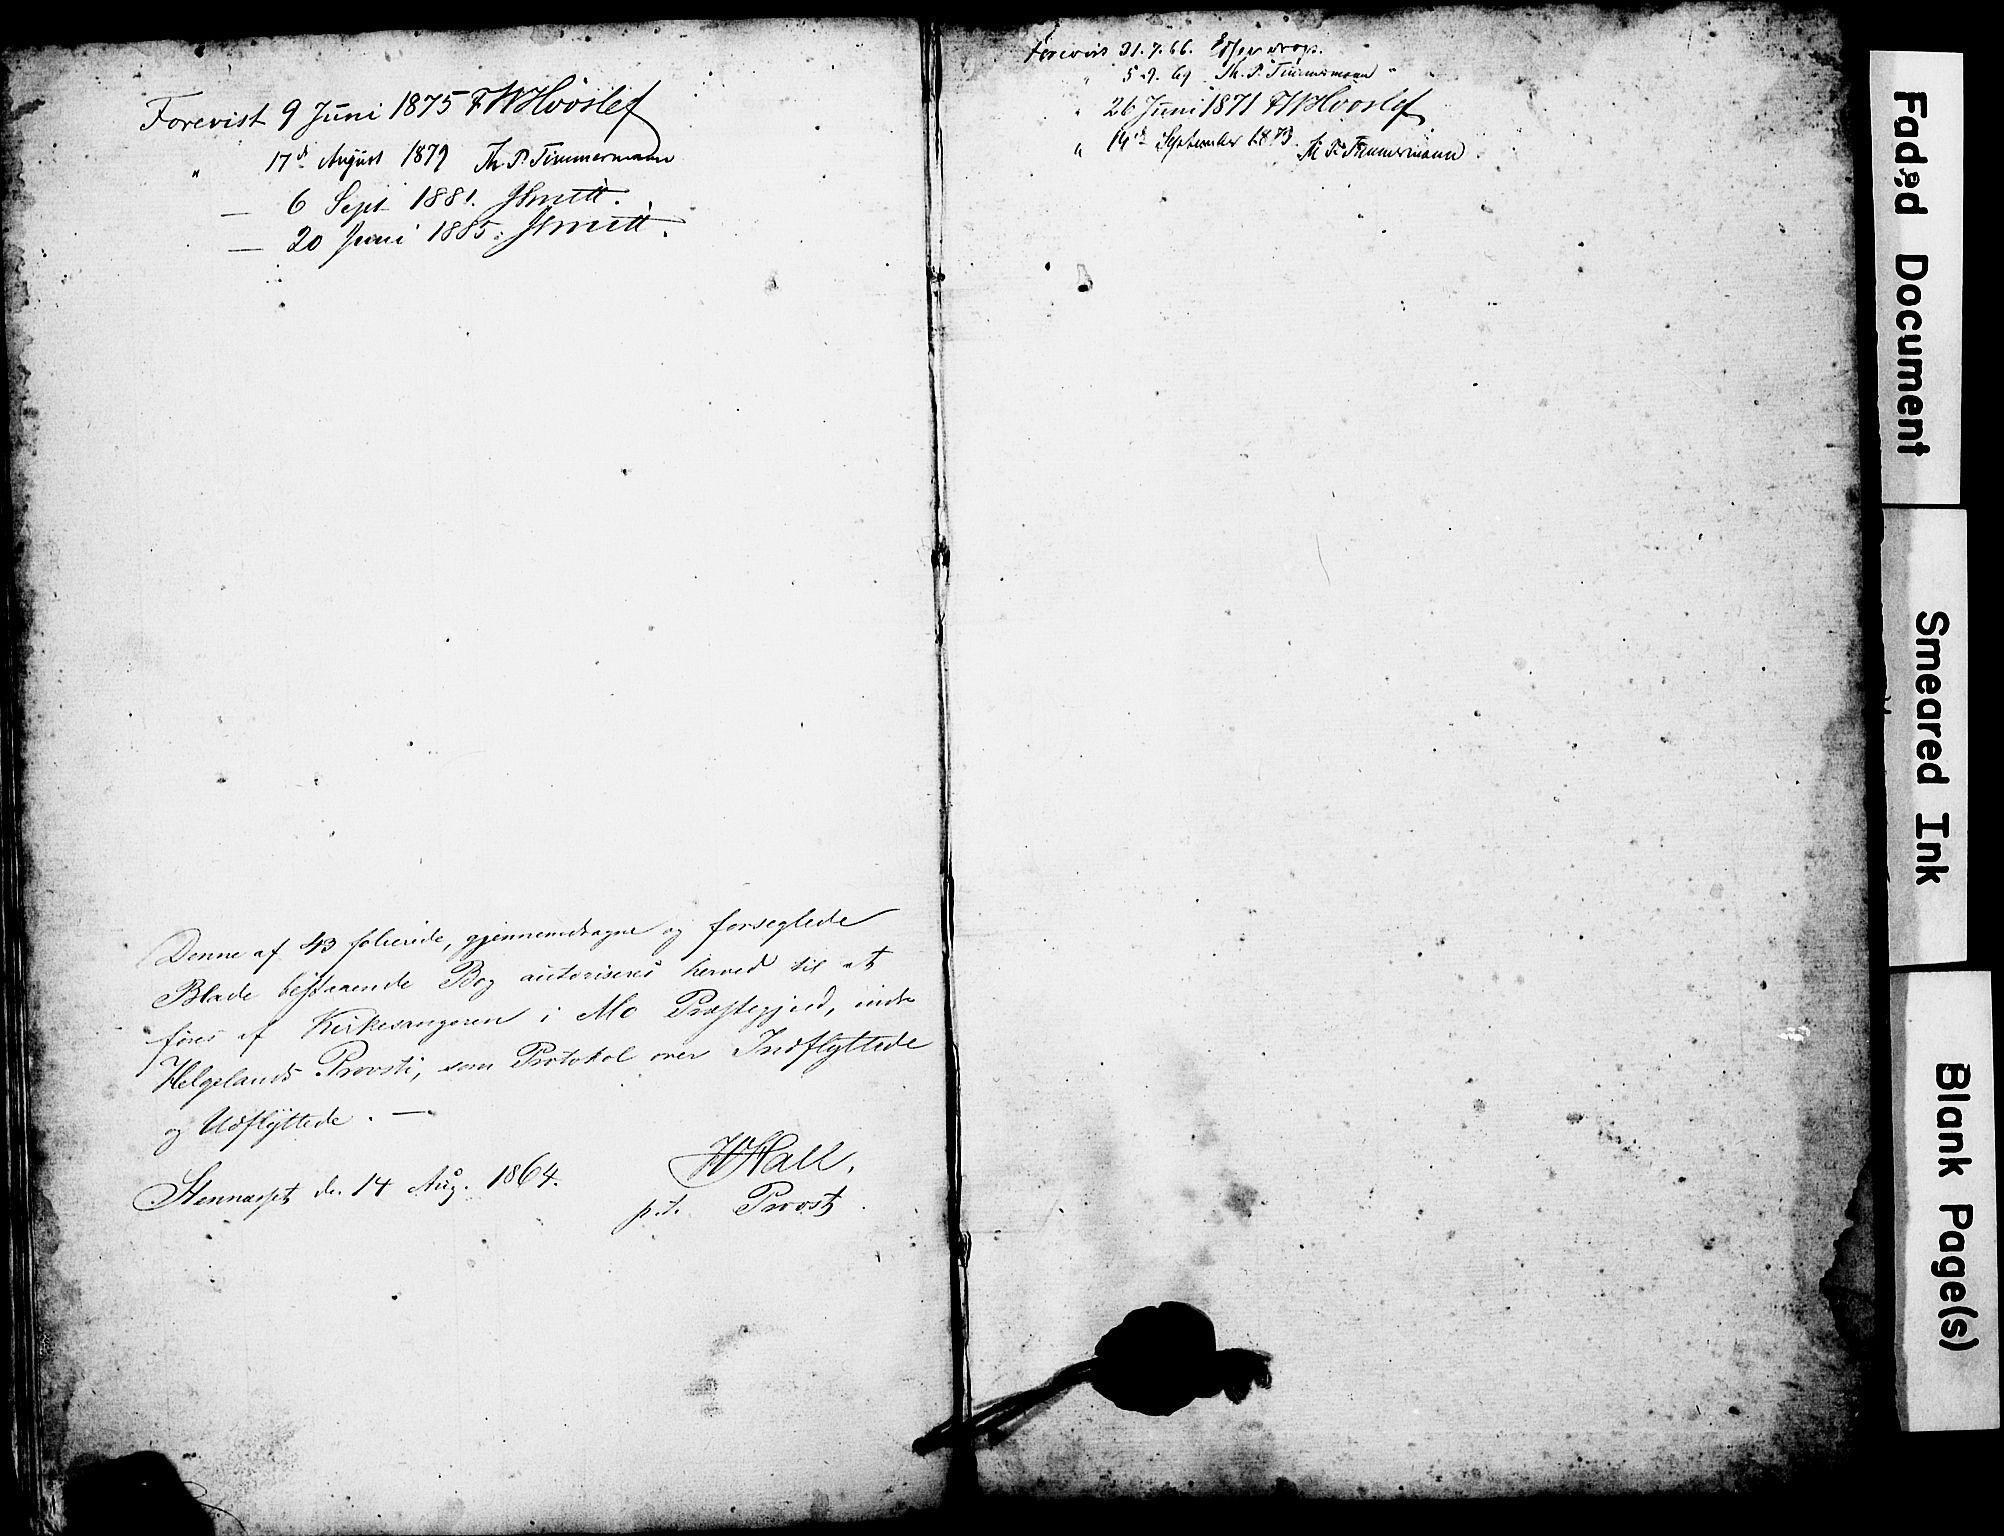 SAT, Ministerialprotokoller, klokkerbøker og fødselsregistre - Nordland, 827/L0419: Klokkerbok nr. 827C08, 1864-1885